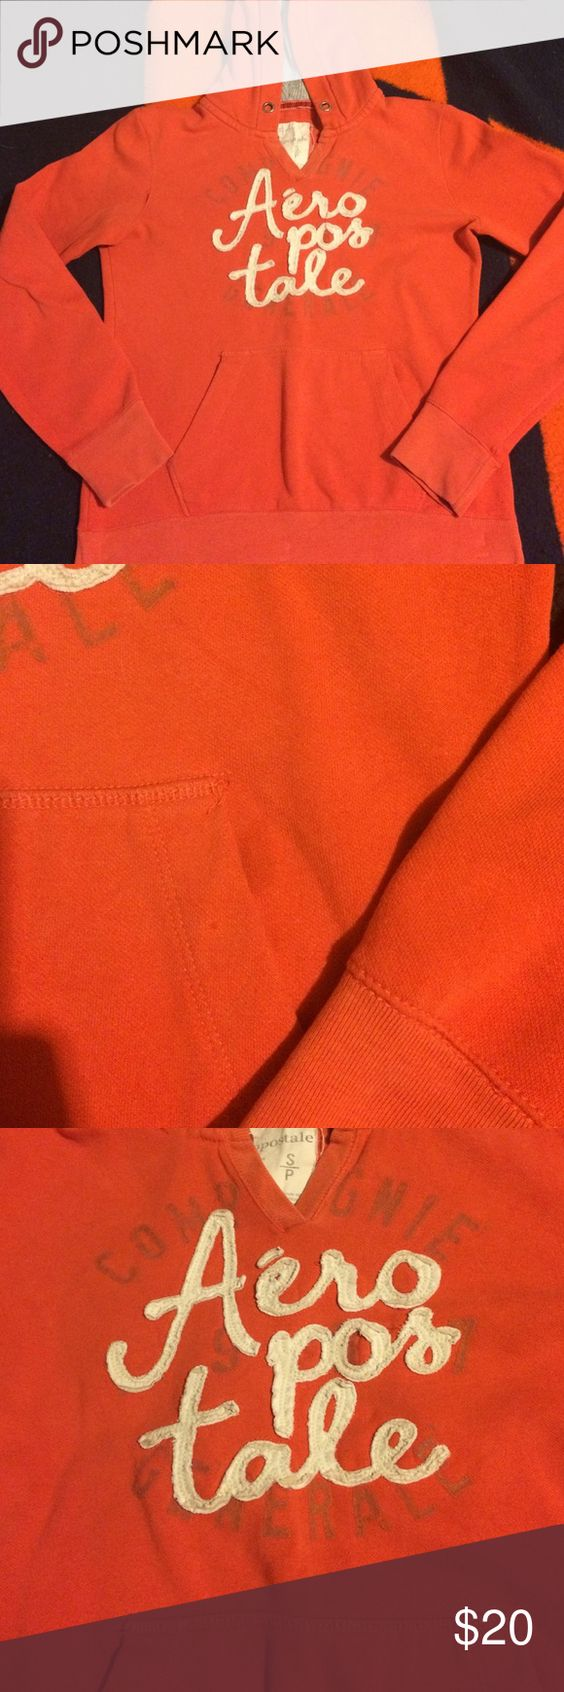 Hooded sweatshirt Hooded sweatshirt used, no drawstrings, one stain left front pocket Aeropostale Tops Sweatshirts & Hoodies